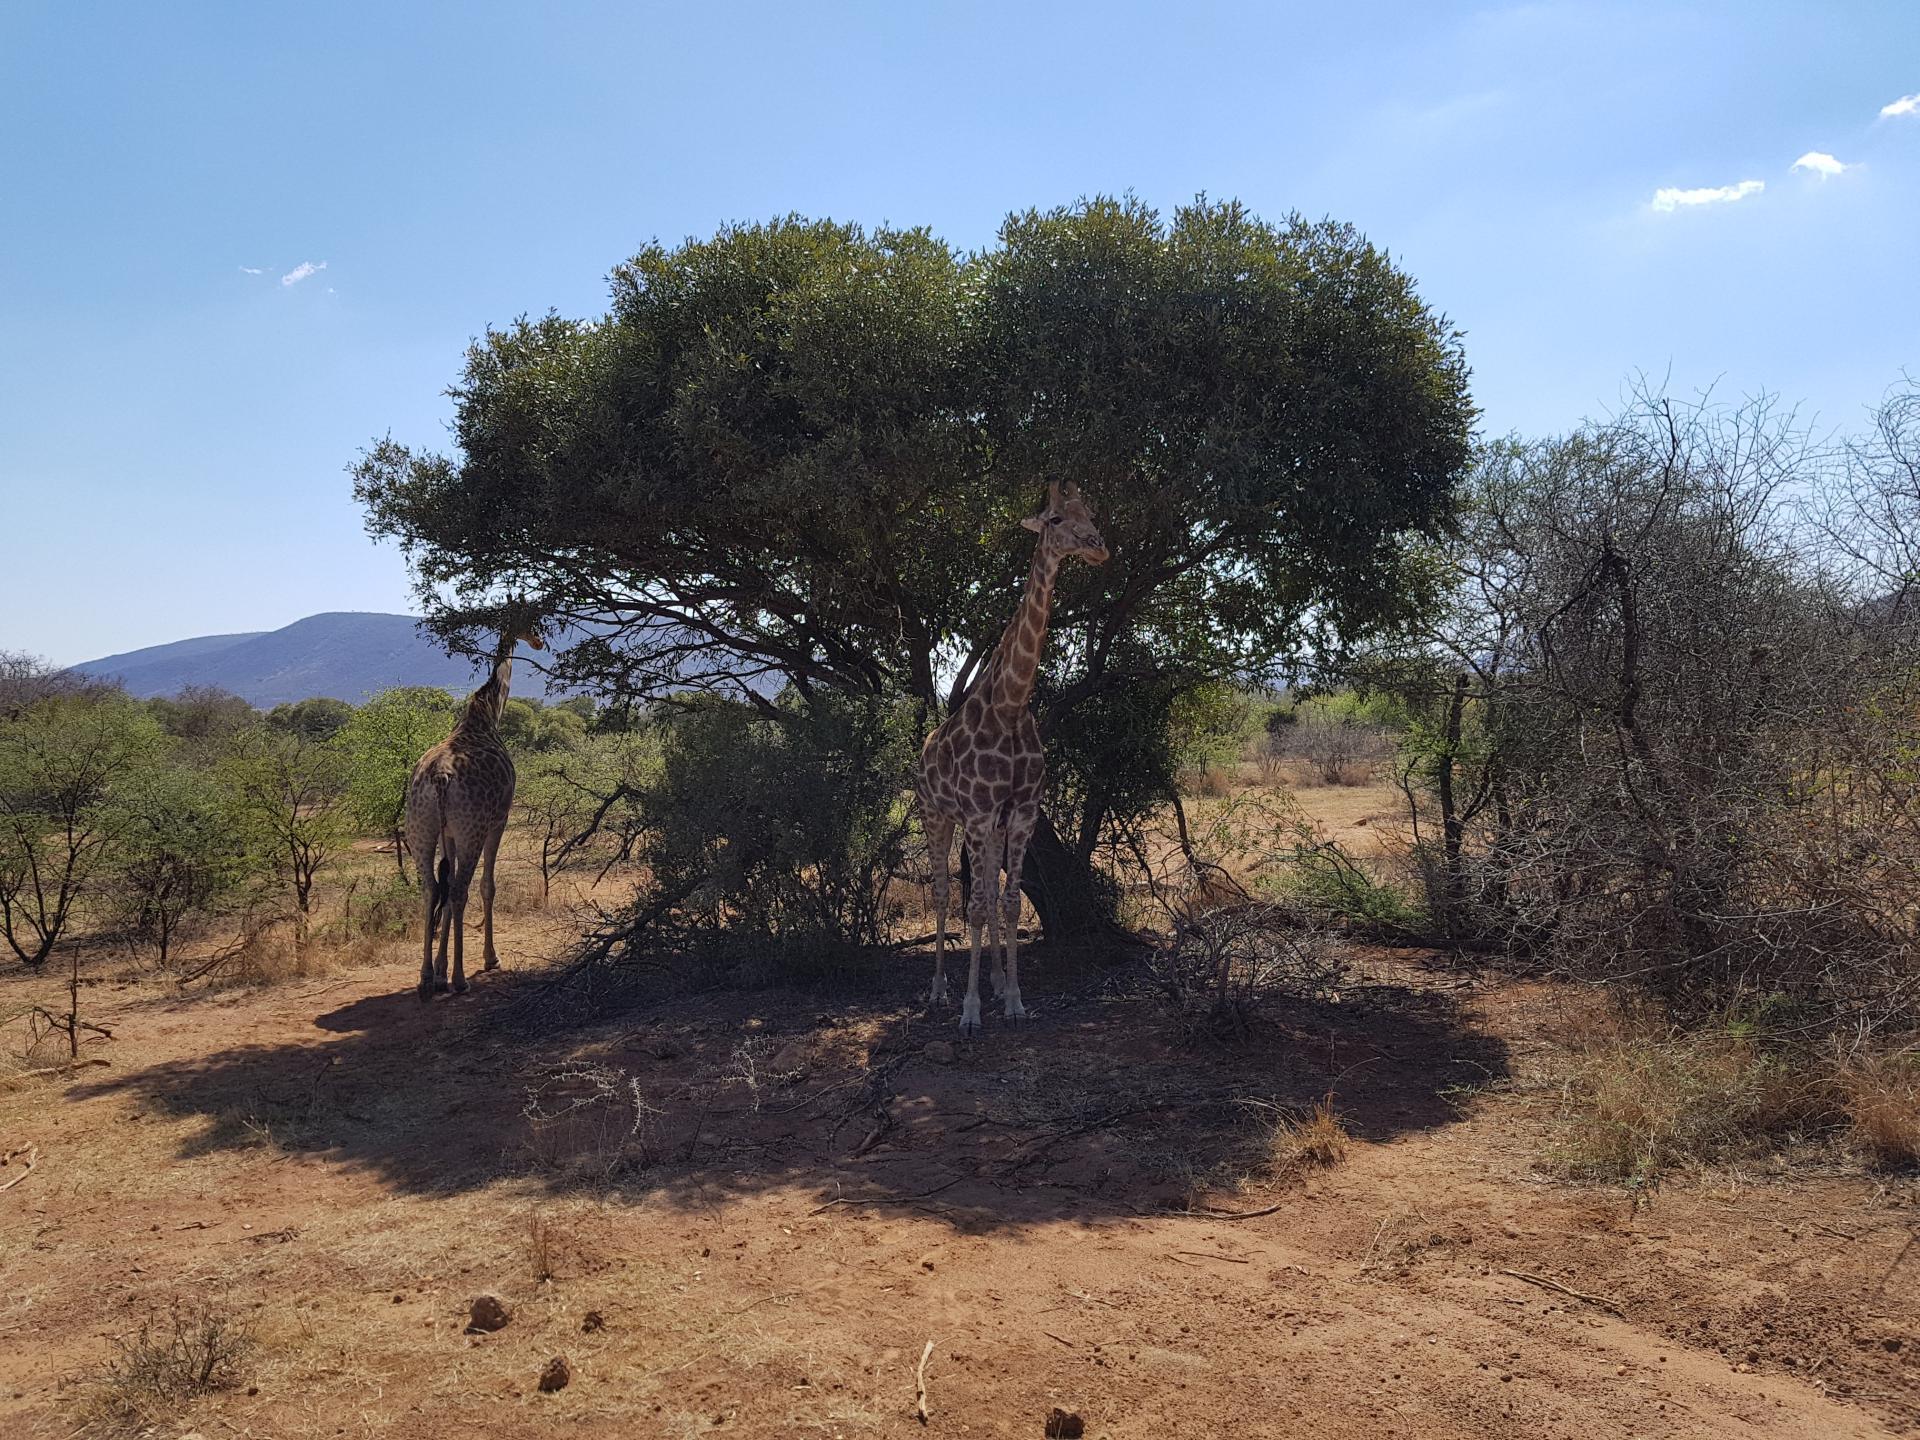 жирафы в тени дерева